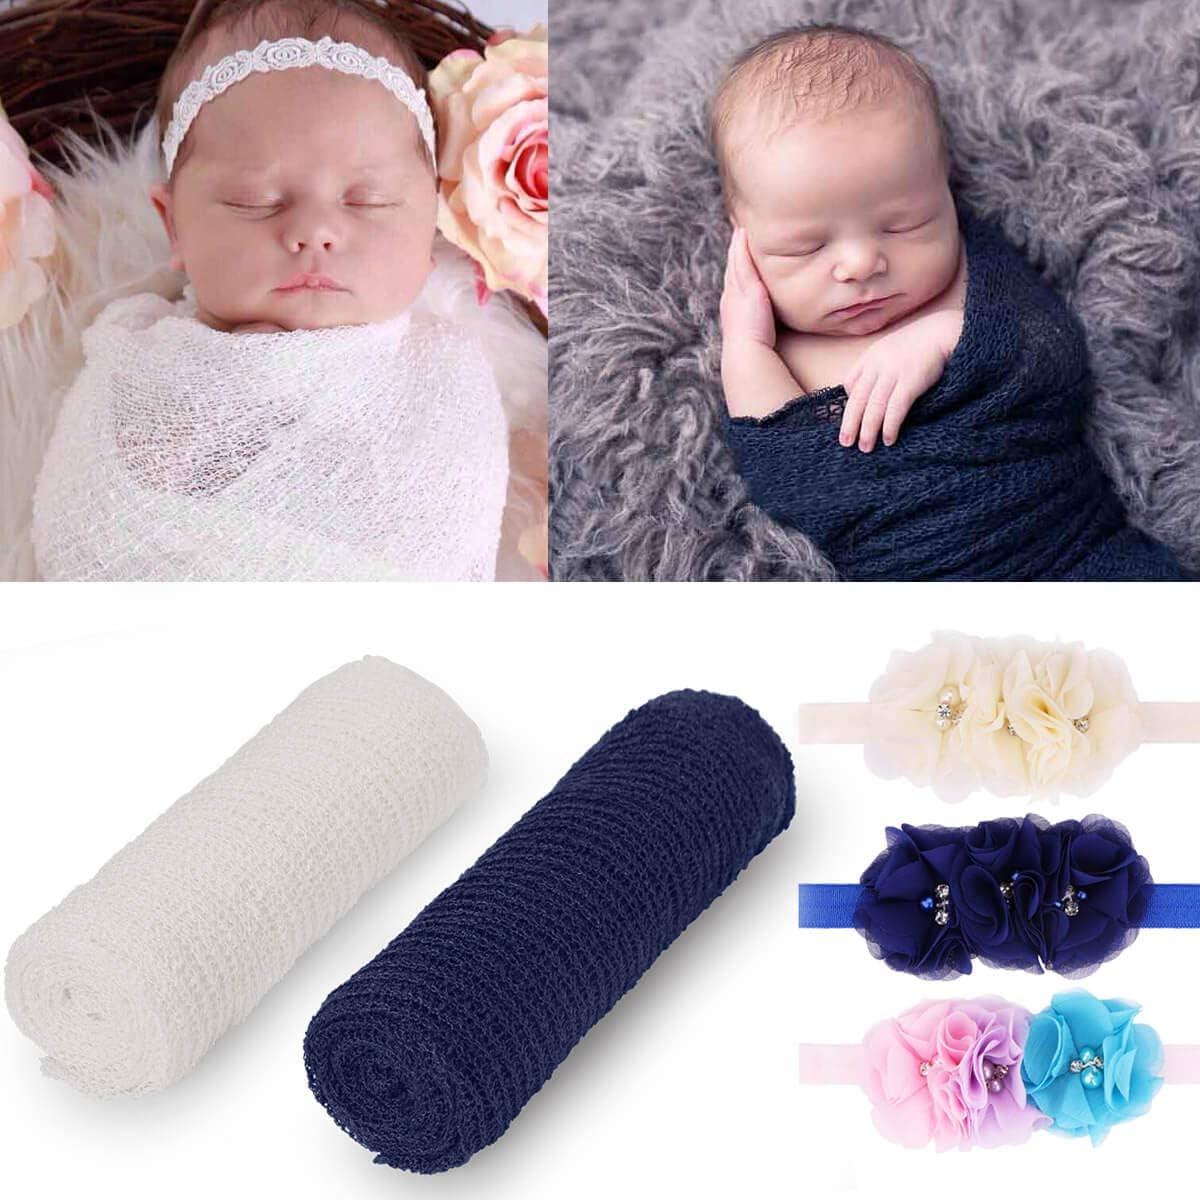 Newborn Baby Boys Girls Photography Props Long Ripple Wrap,Photo Shoot Seersucker Blanket